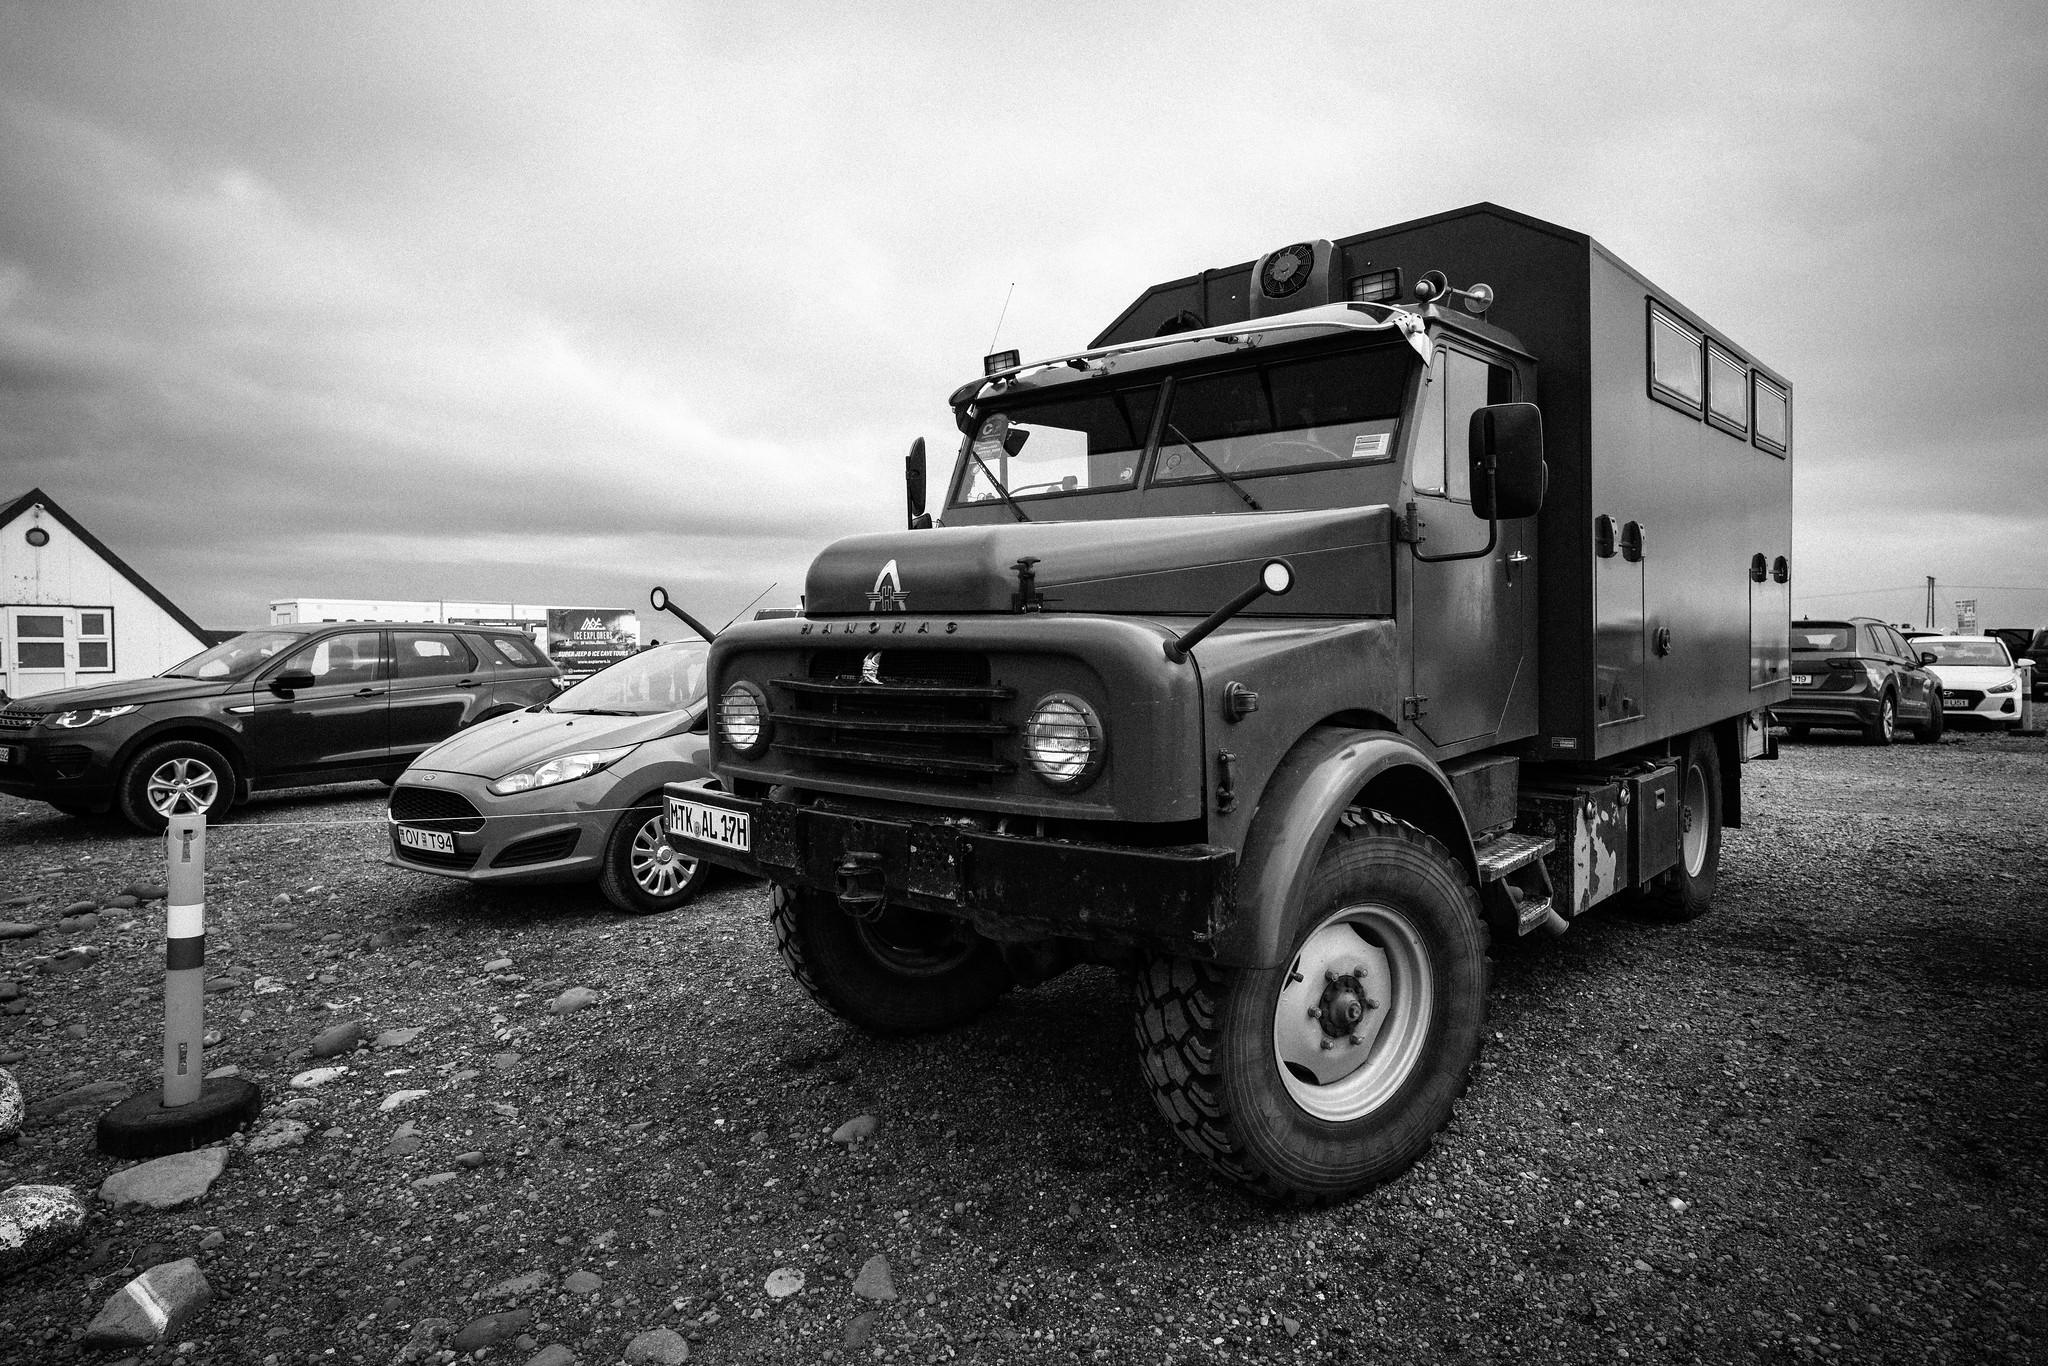 big ass adventure truck + our tiny rental car